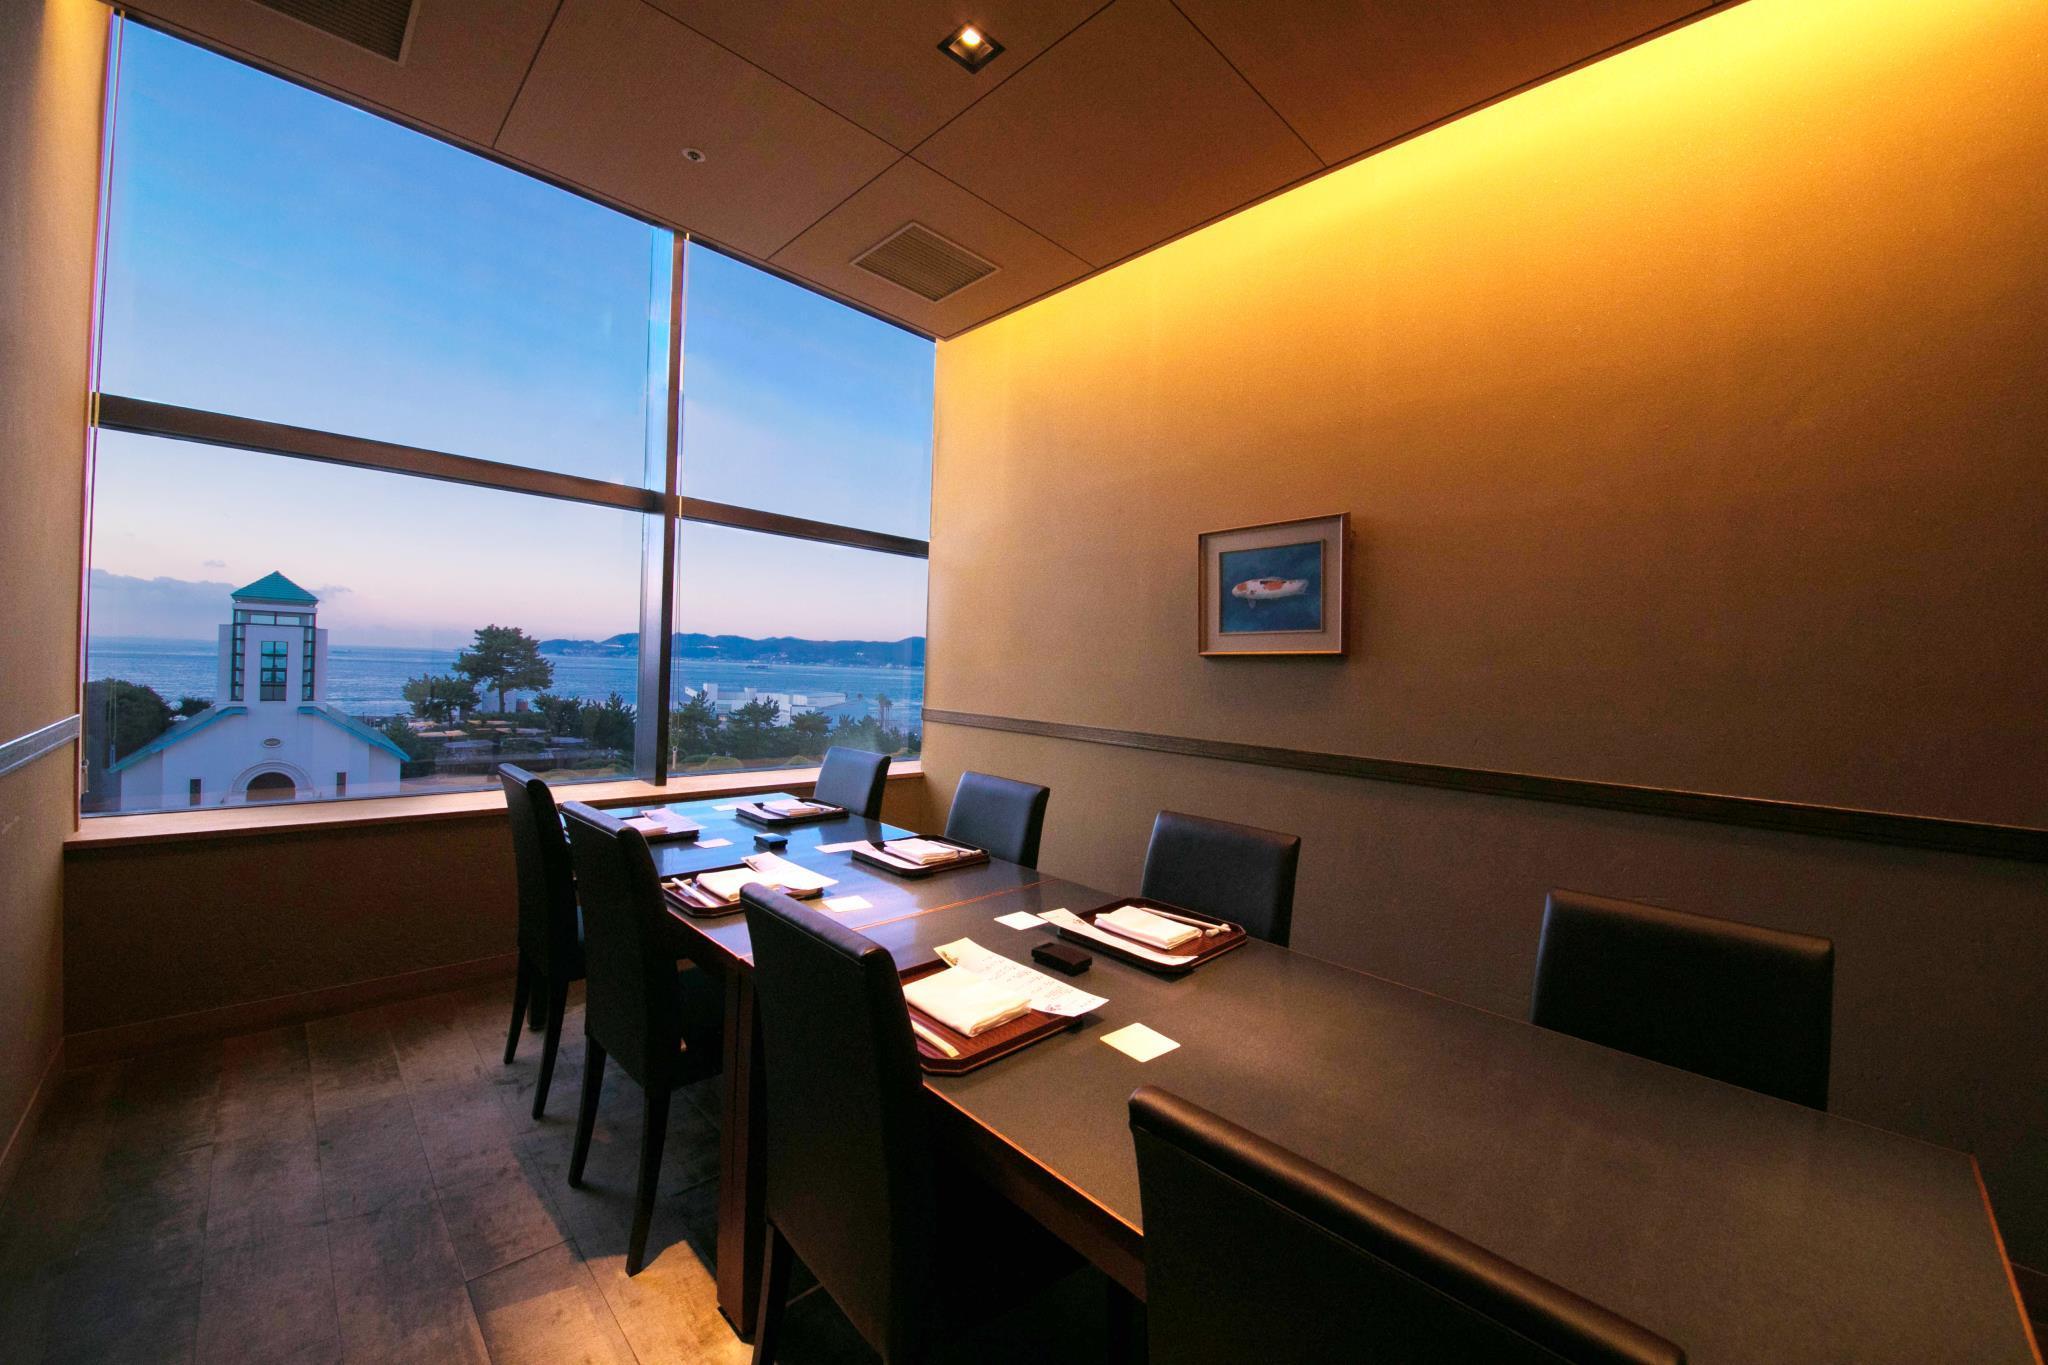 Book Seaside Hotel Maiko Villa Kobe In Japan 2020 Promos